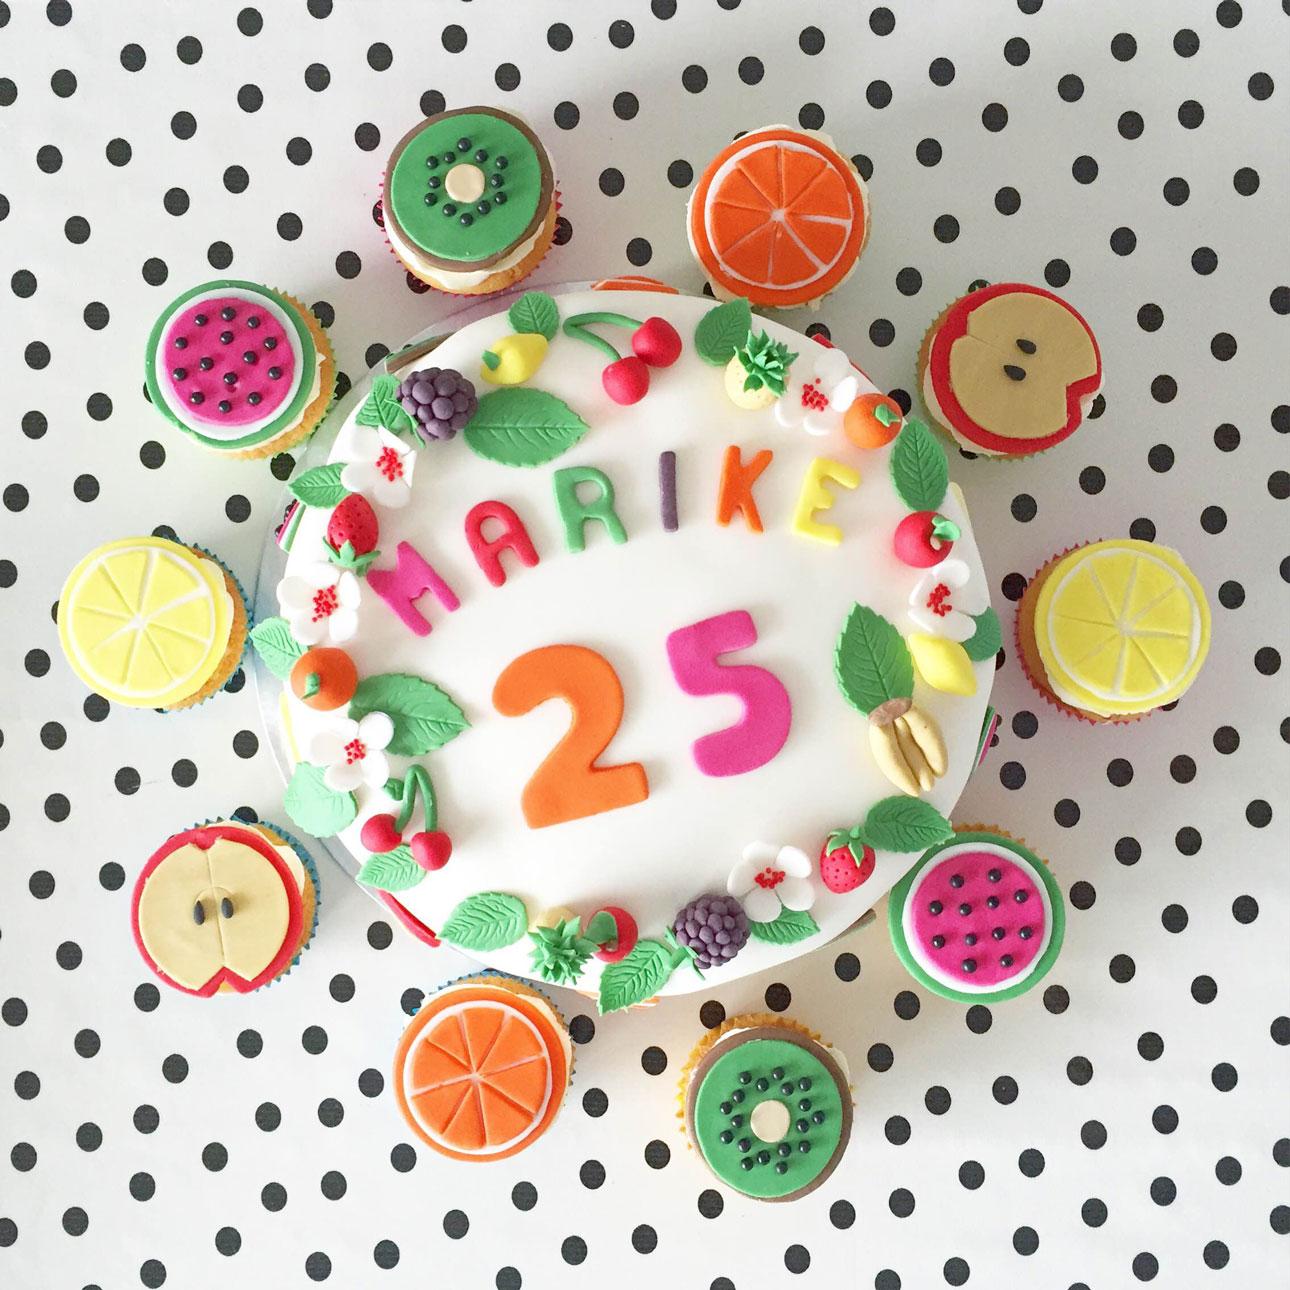 Mamalifestyle Marike - Happy Moments juni 2015 - 10. taart